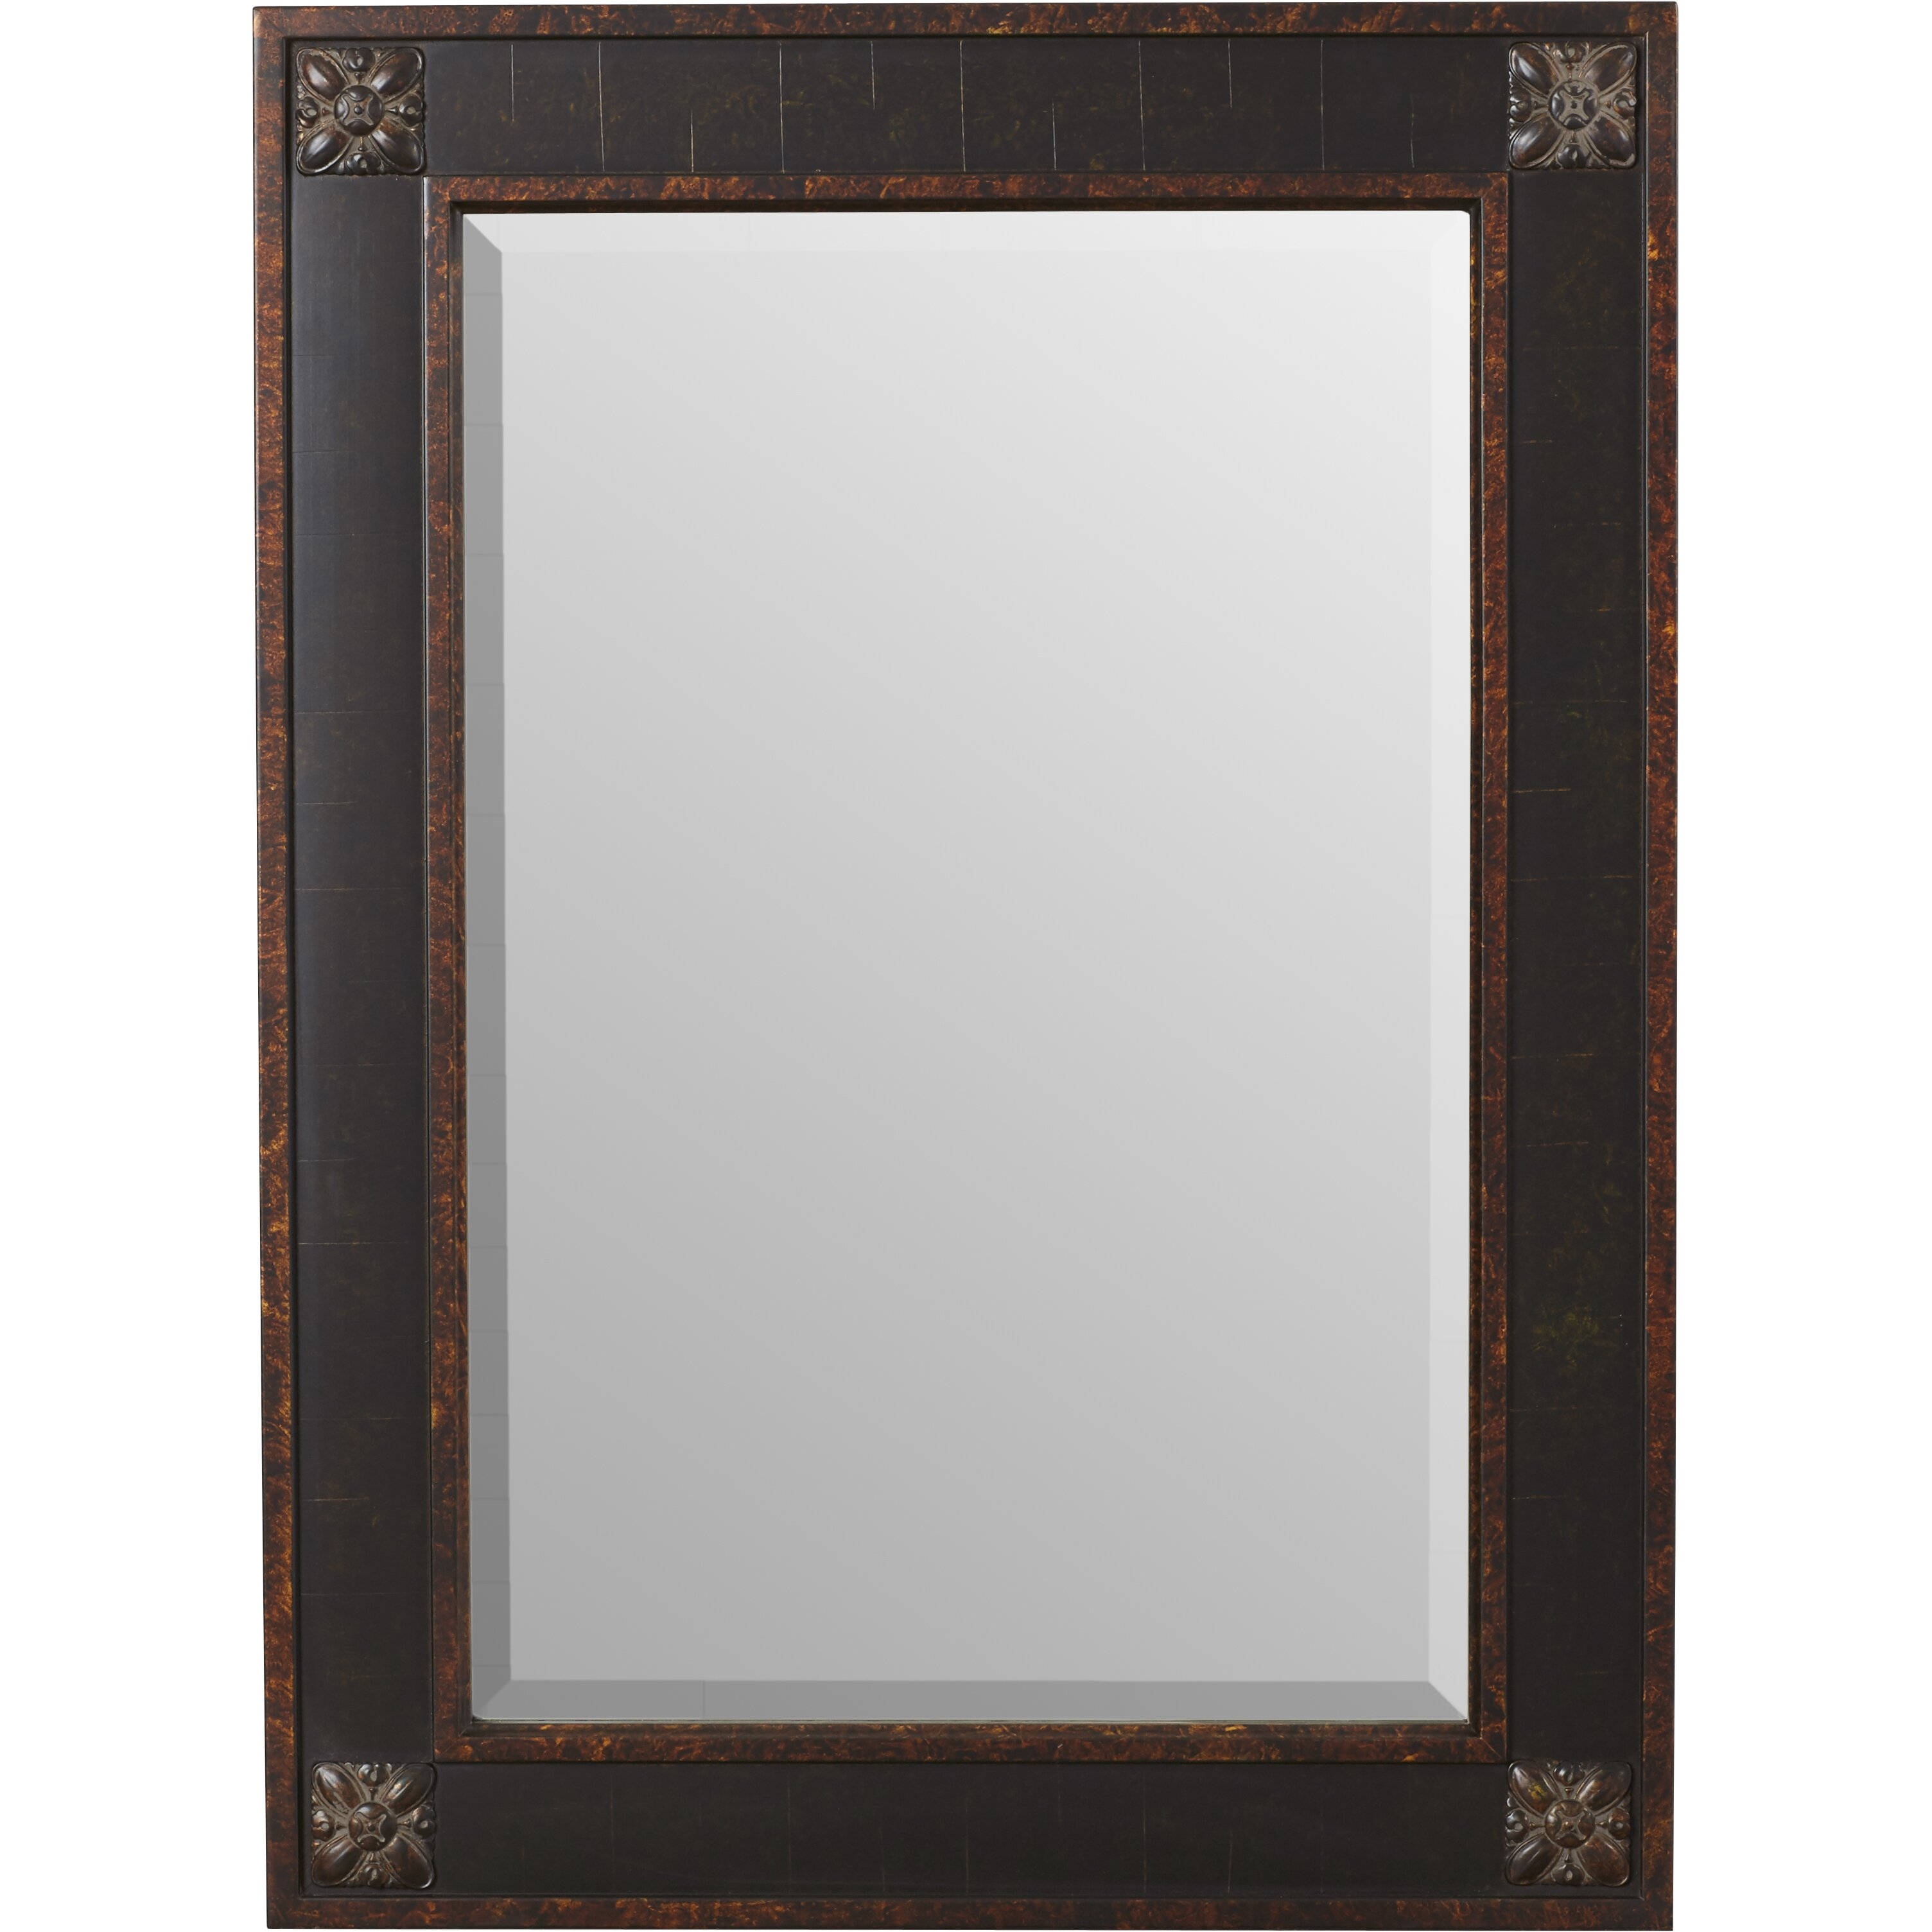 Rosalind wheeler rectangular beveled vanity mirror in for Beveled mirror